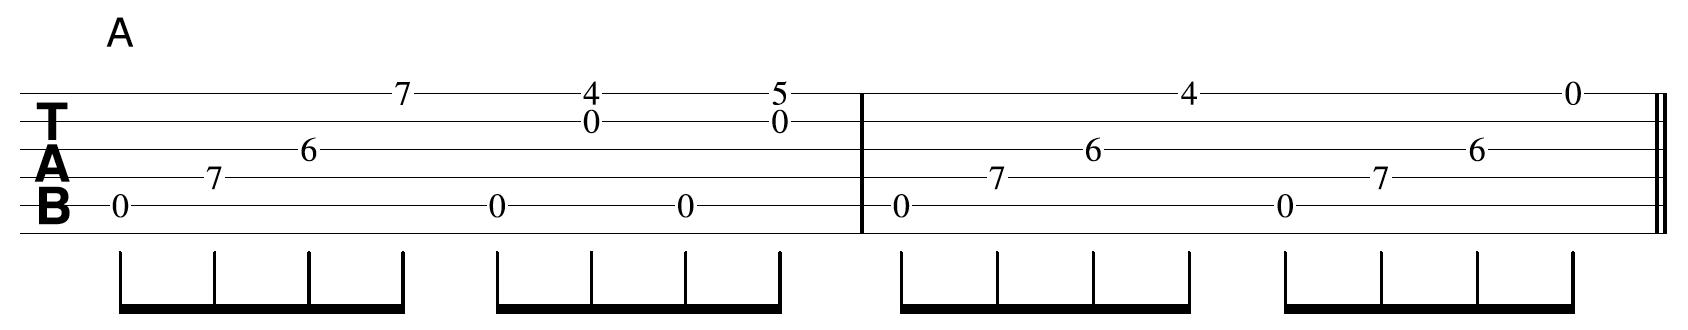 Creative Guitar Chord Example 2